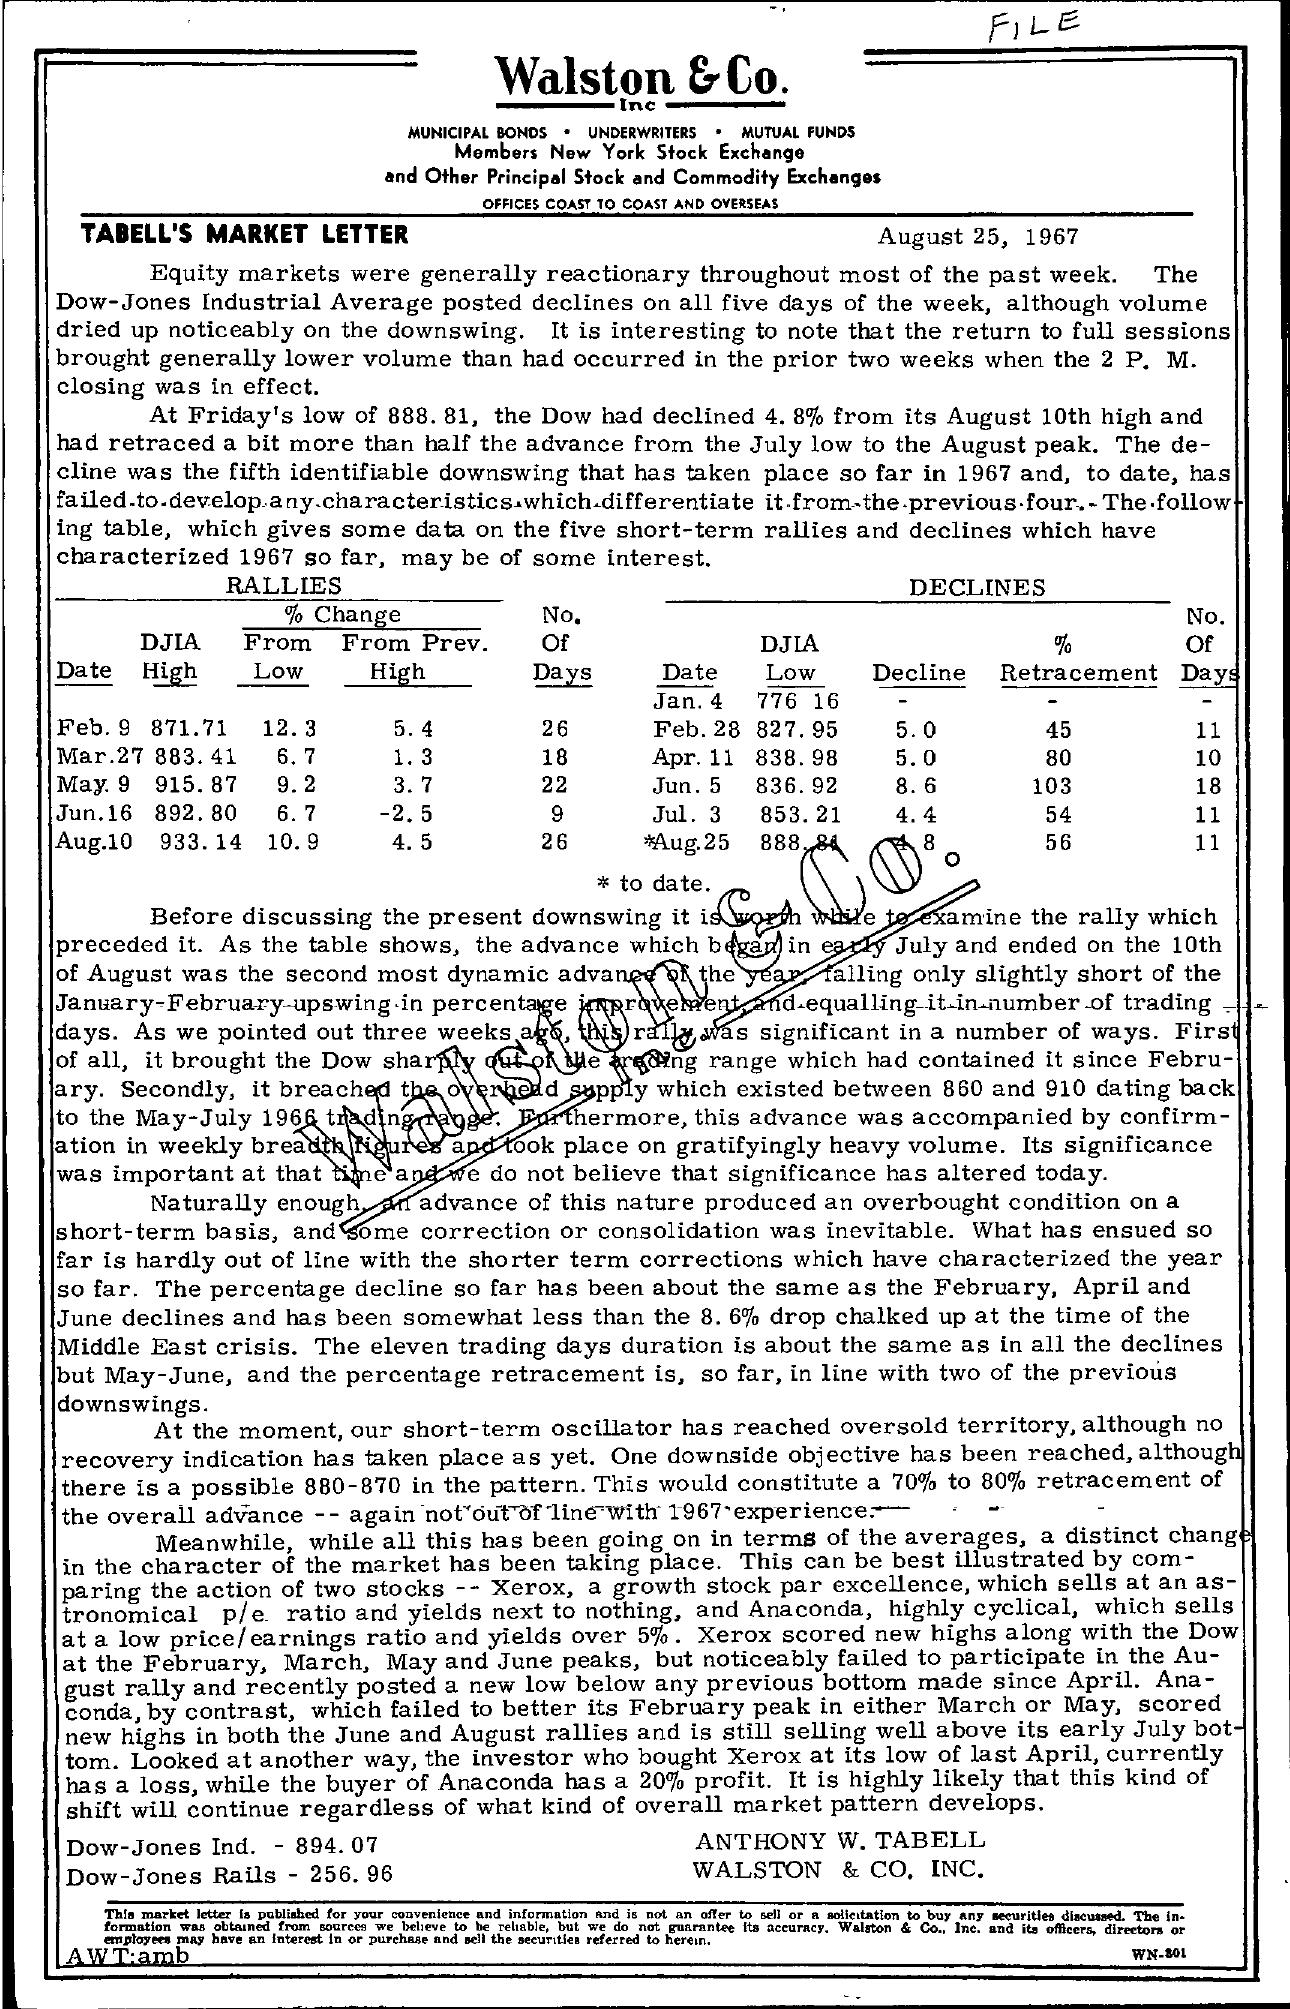 Tabell's Market Letter - August 25, 1967